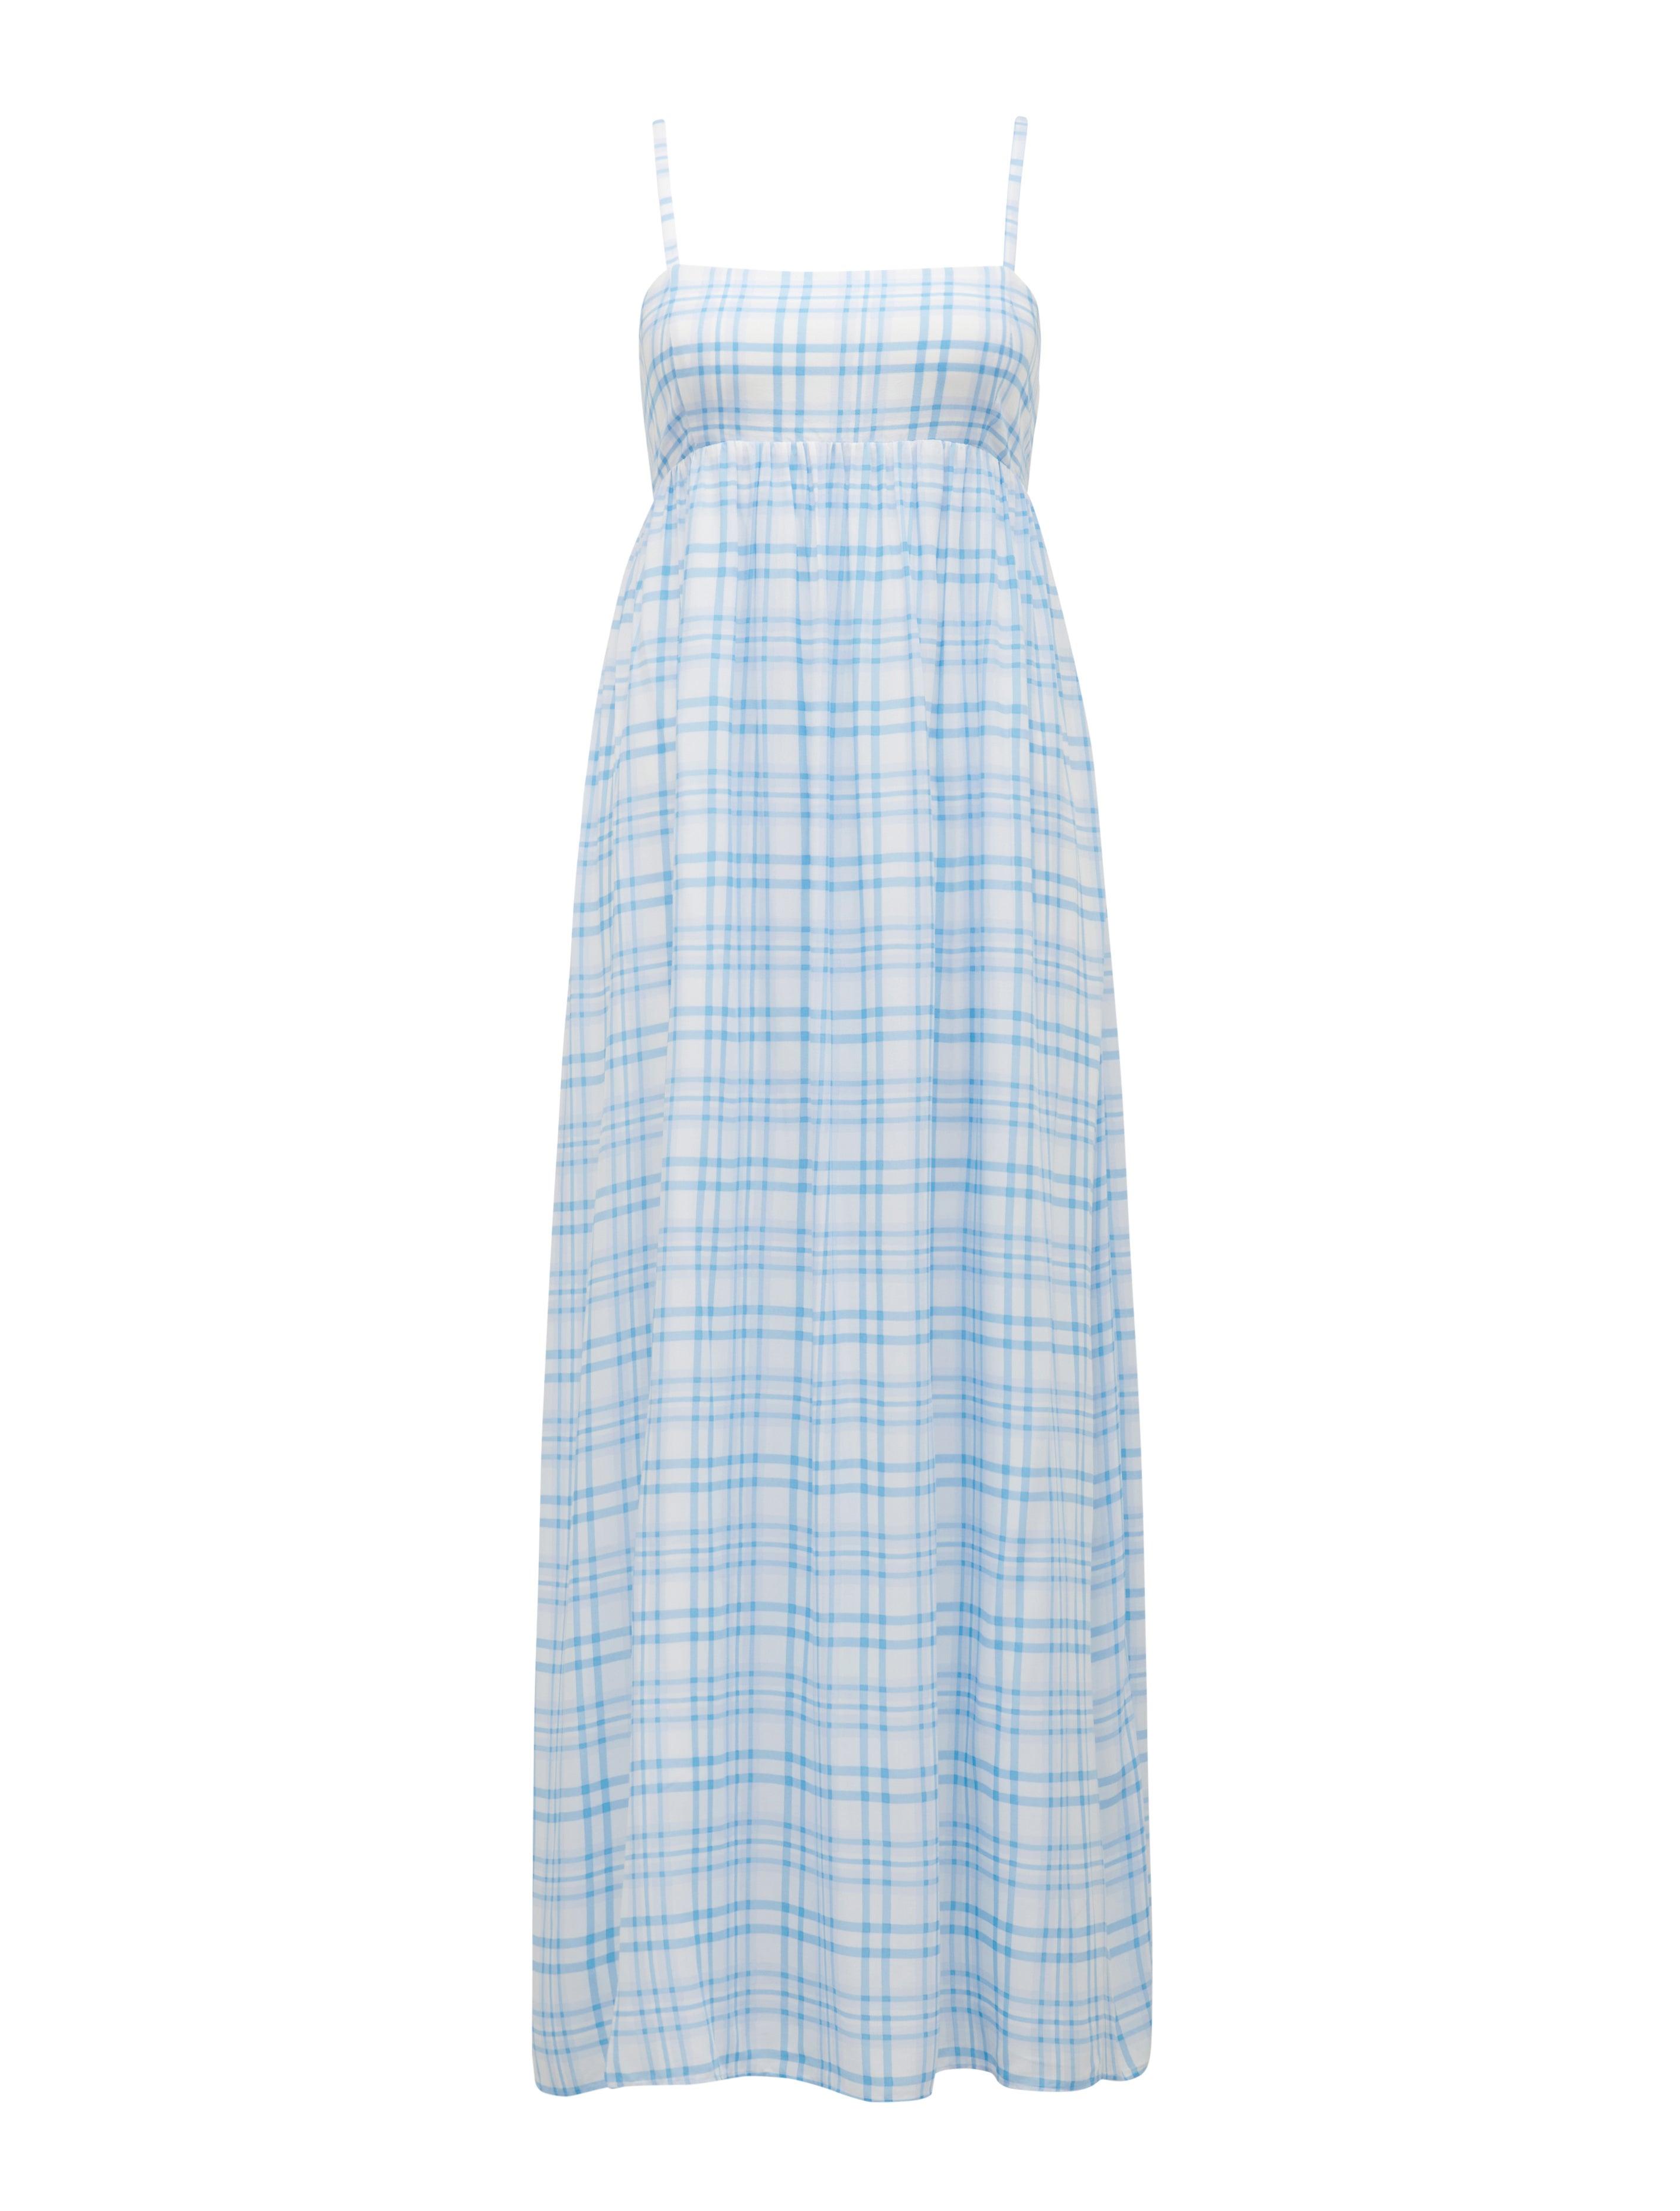 Maisie Check Maxi Dress